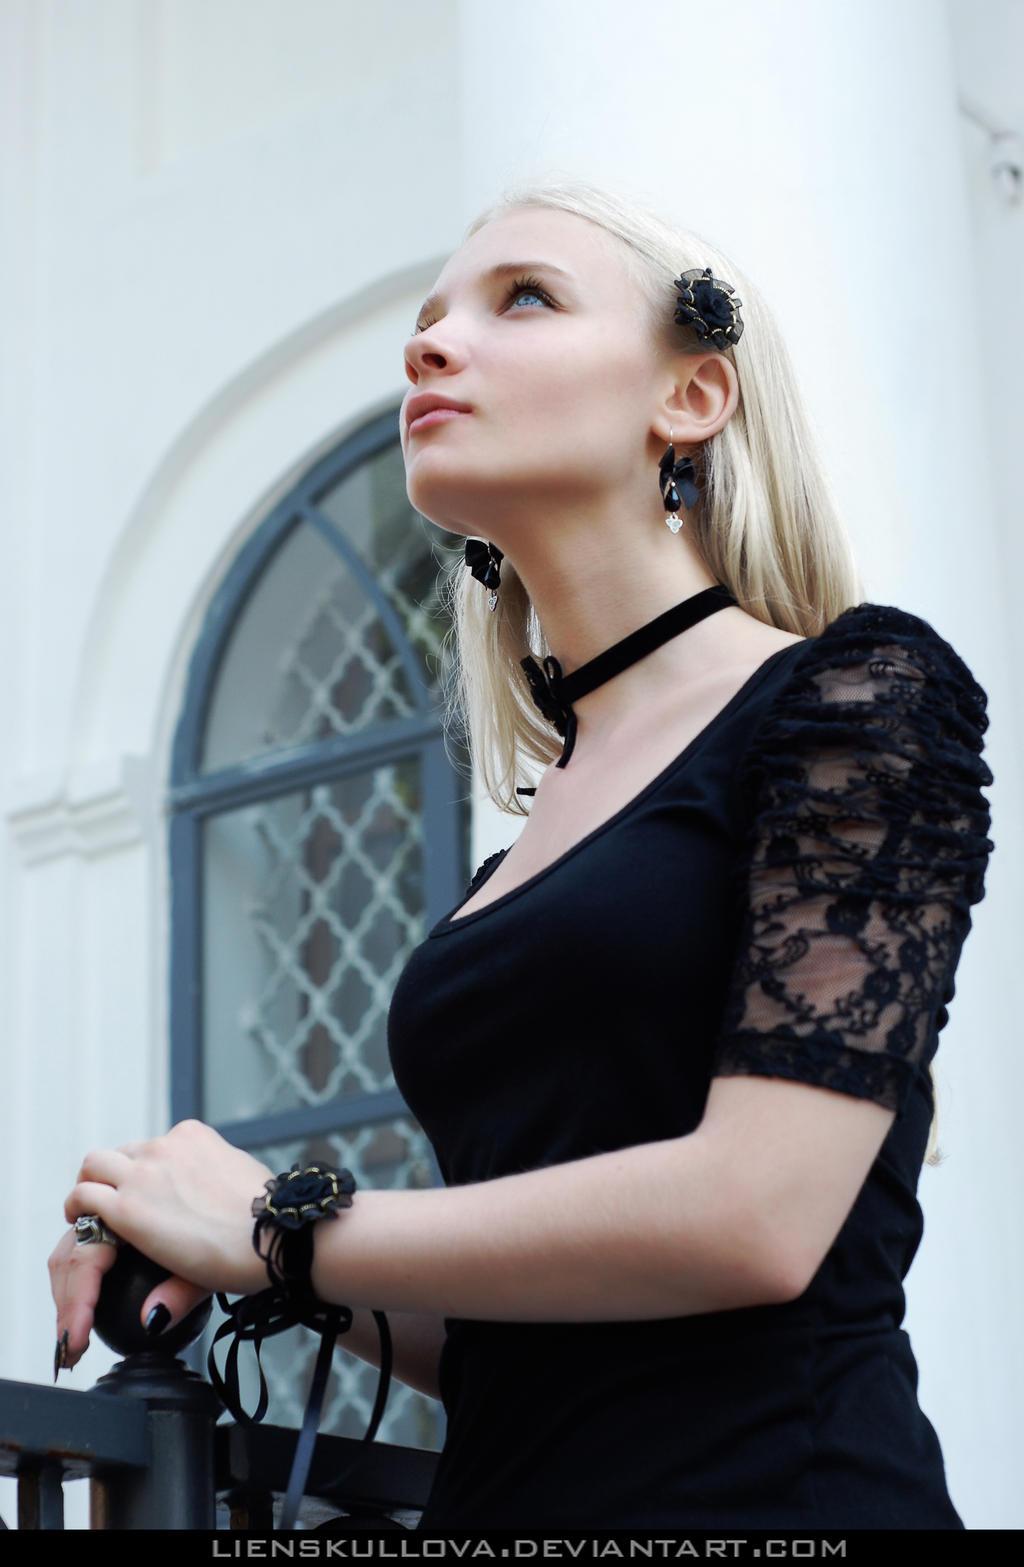 STOCK - Blonde in Black 06 by LienSkullova